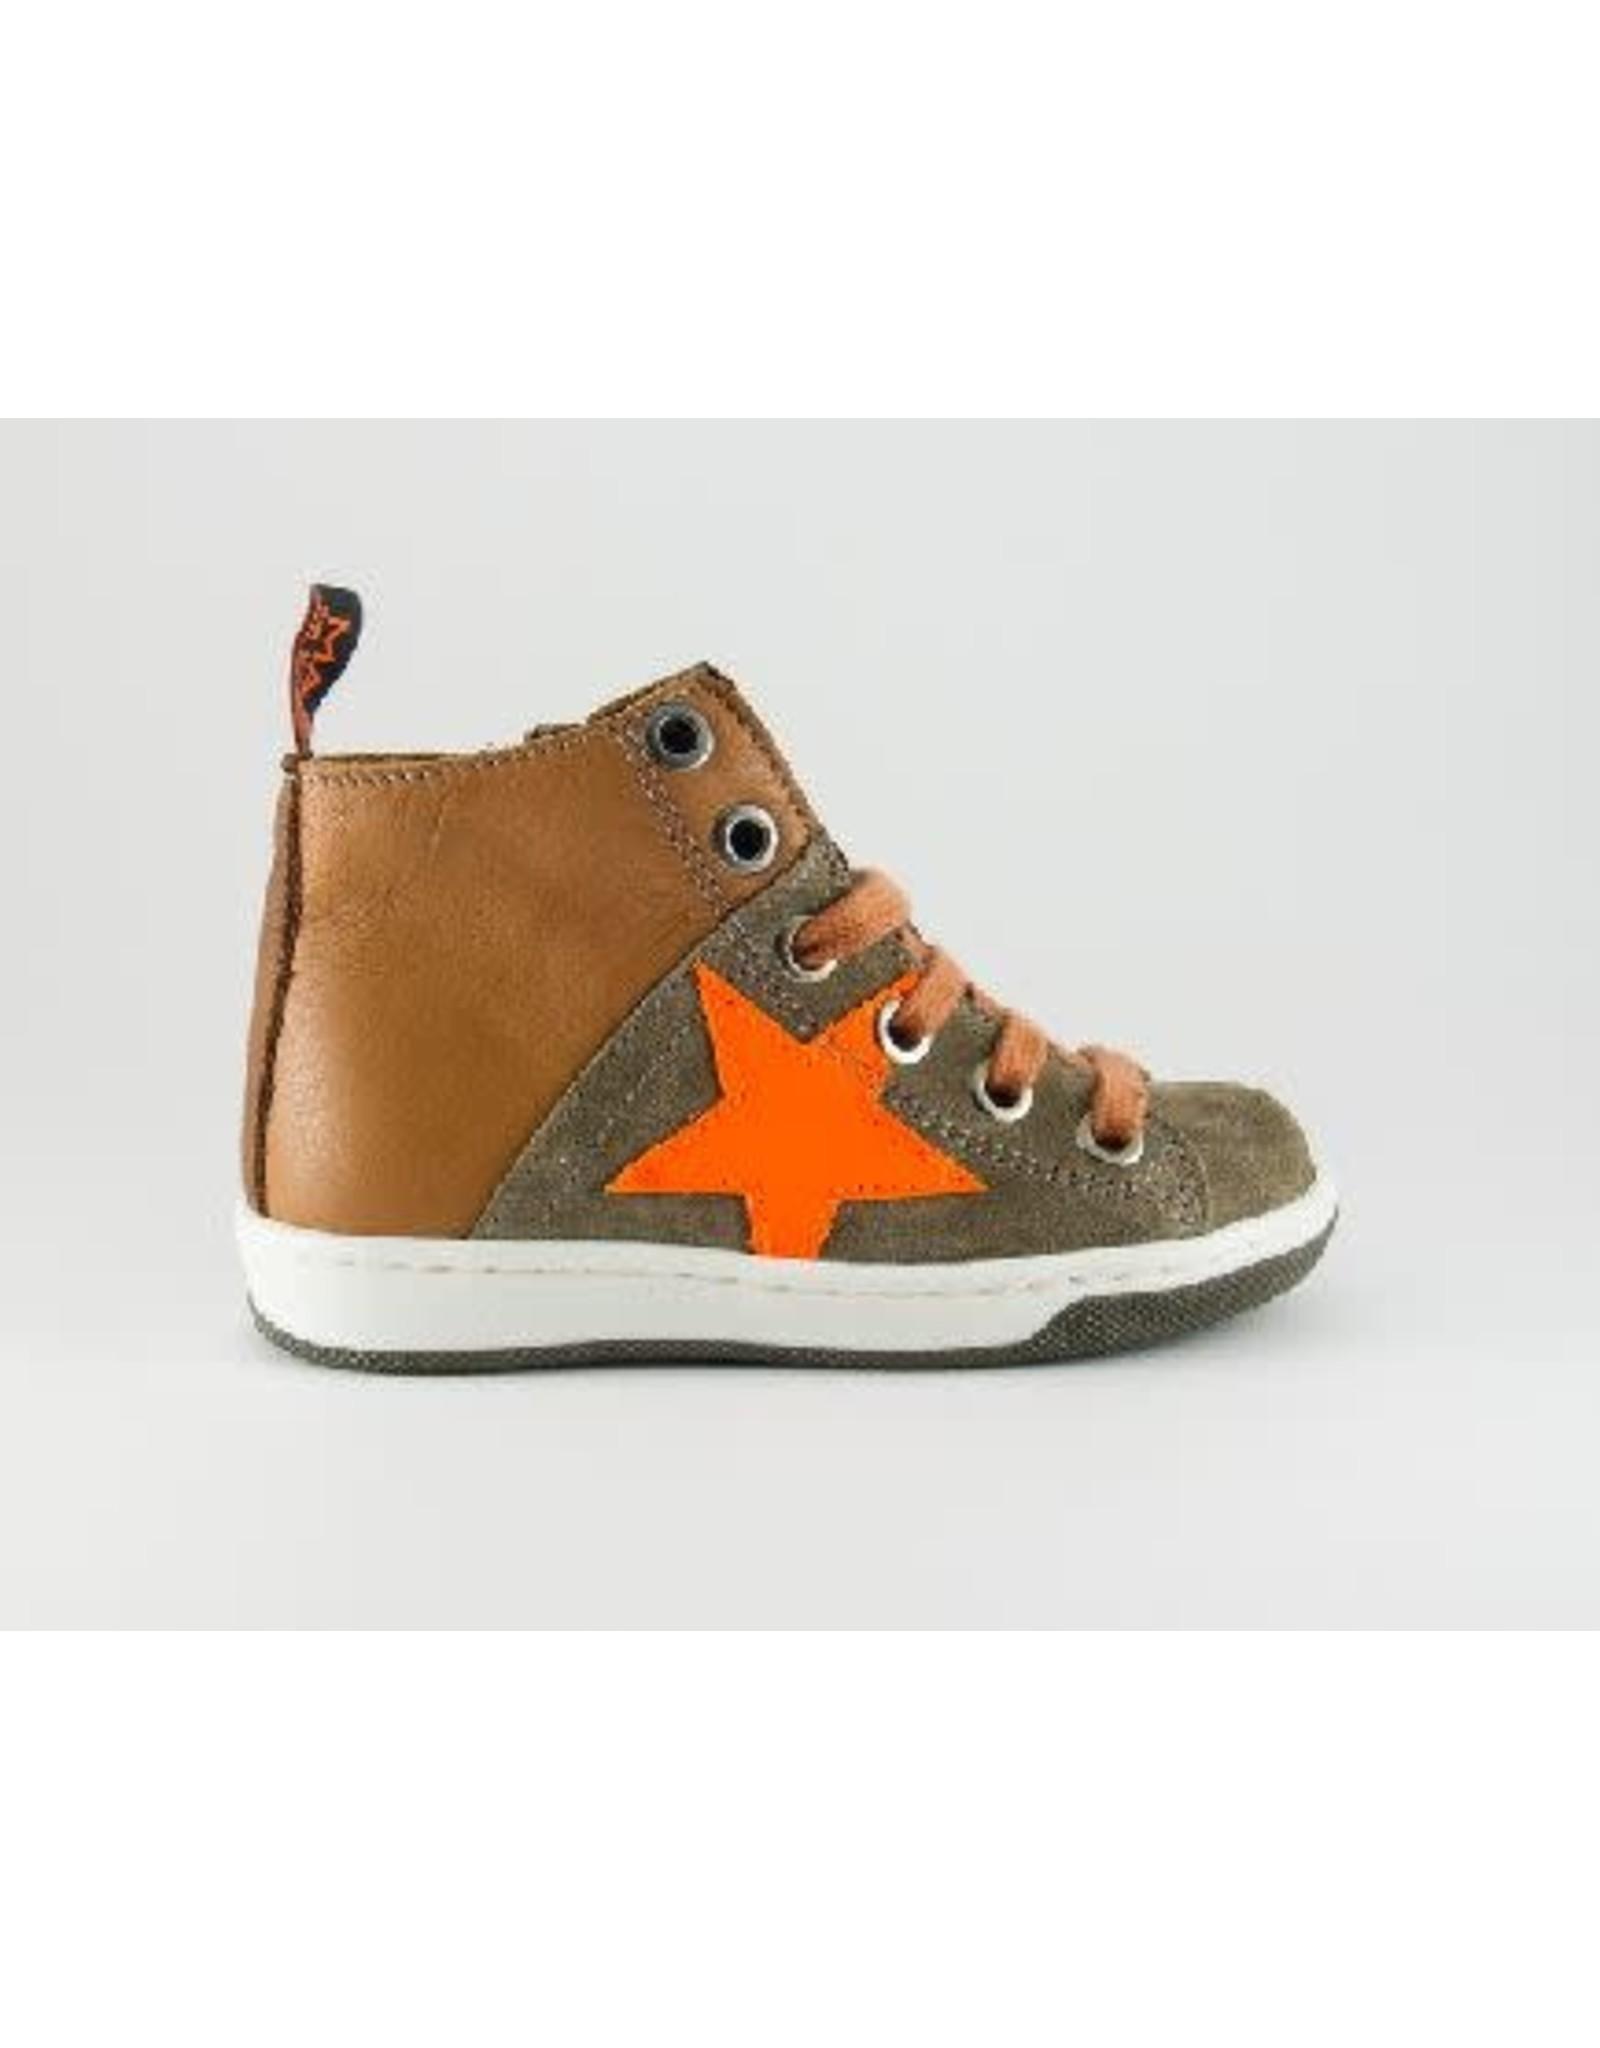 MAÁ sneaker cognac orange star